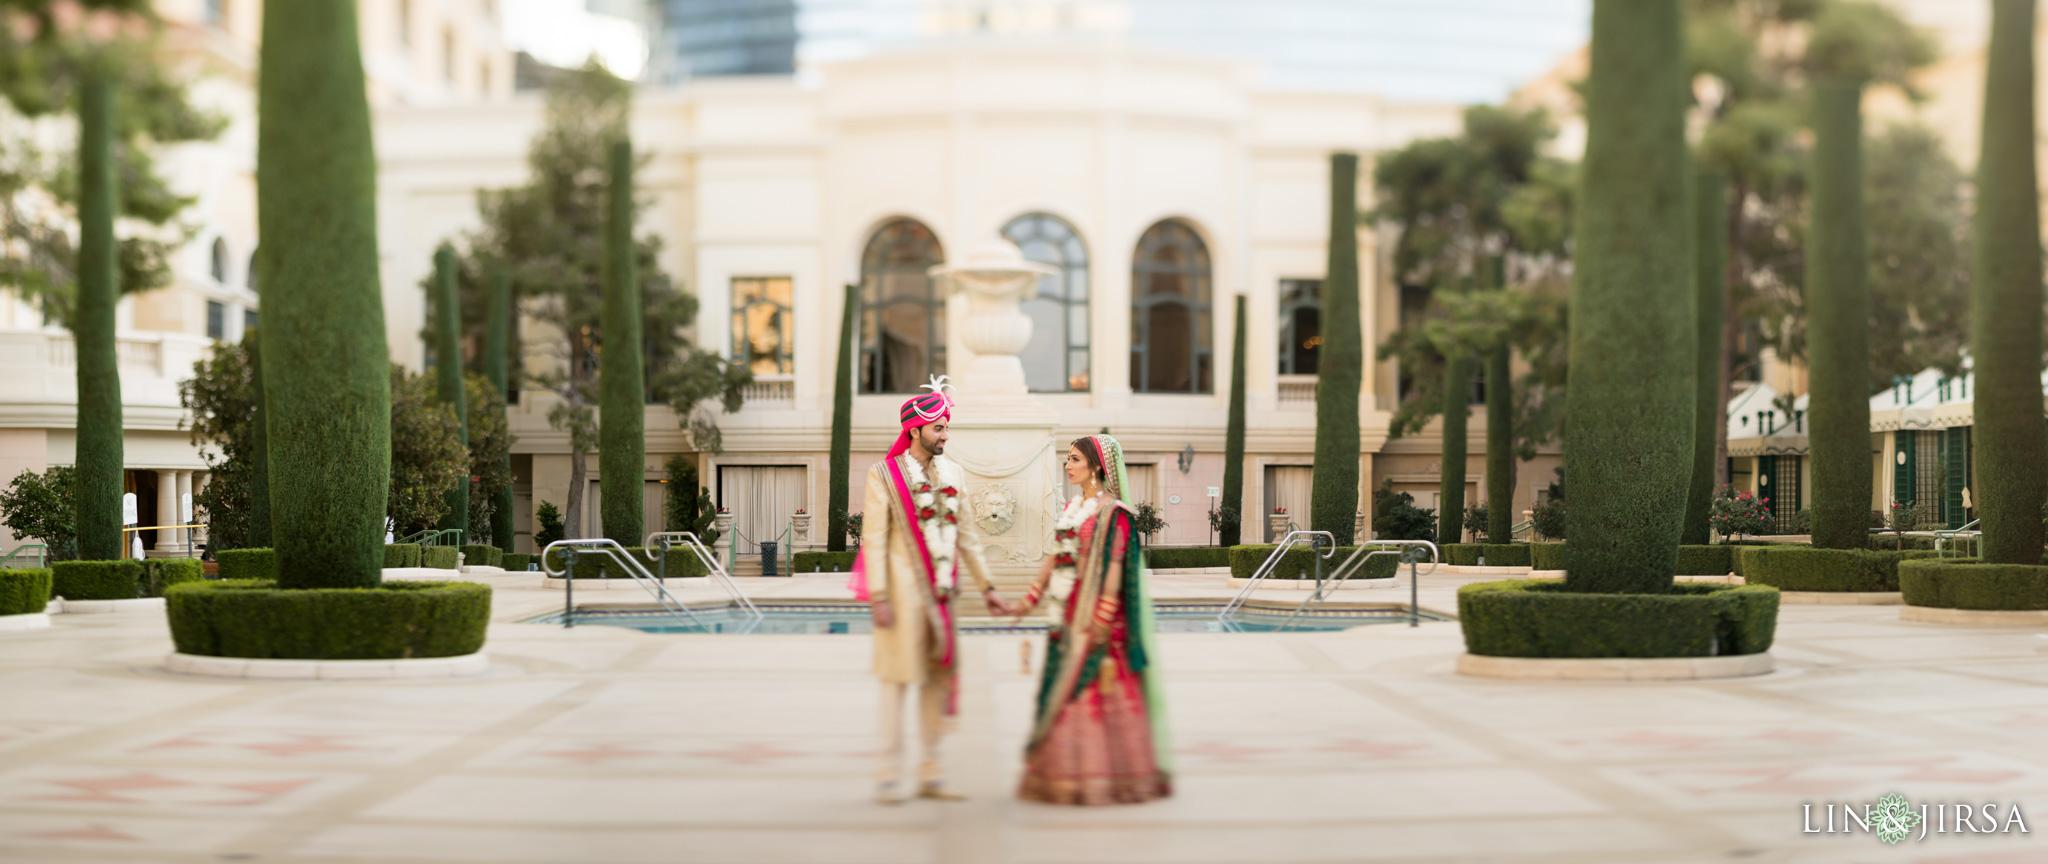 0985-HP-Bellagio-Las-Vegas-Wedding-Photography